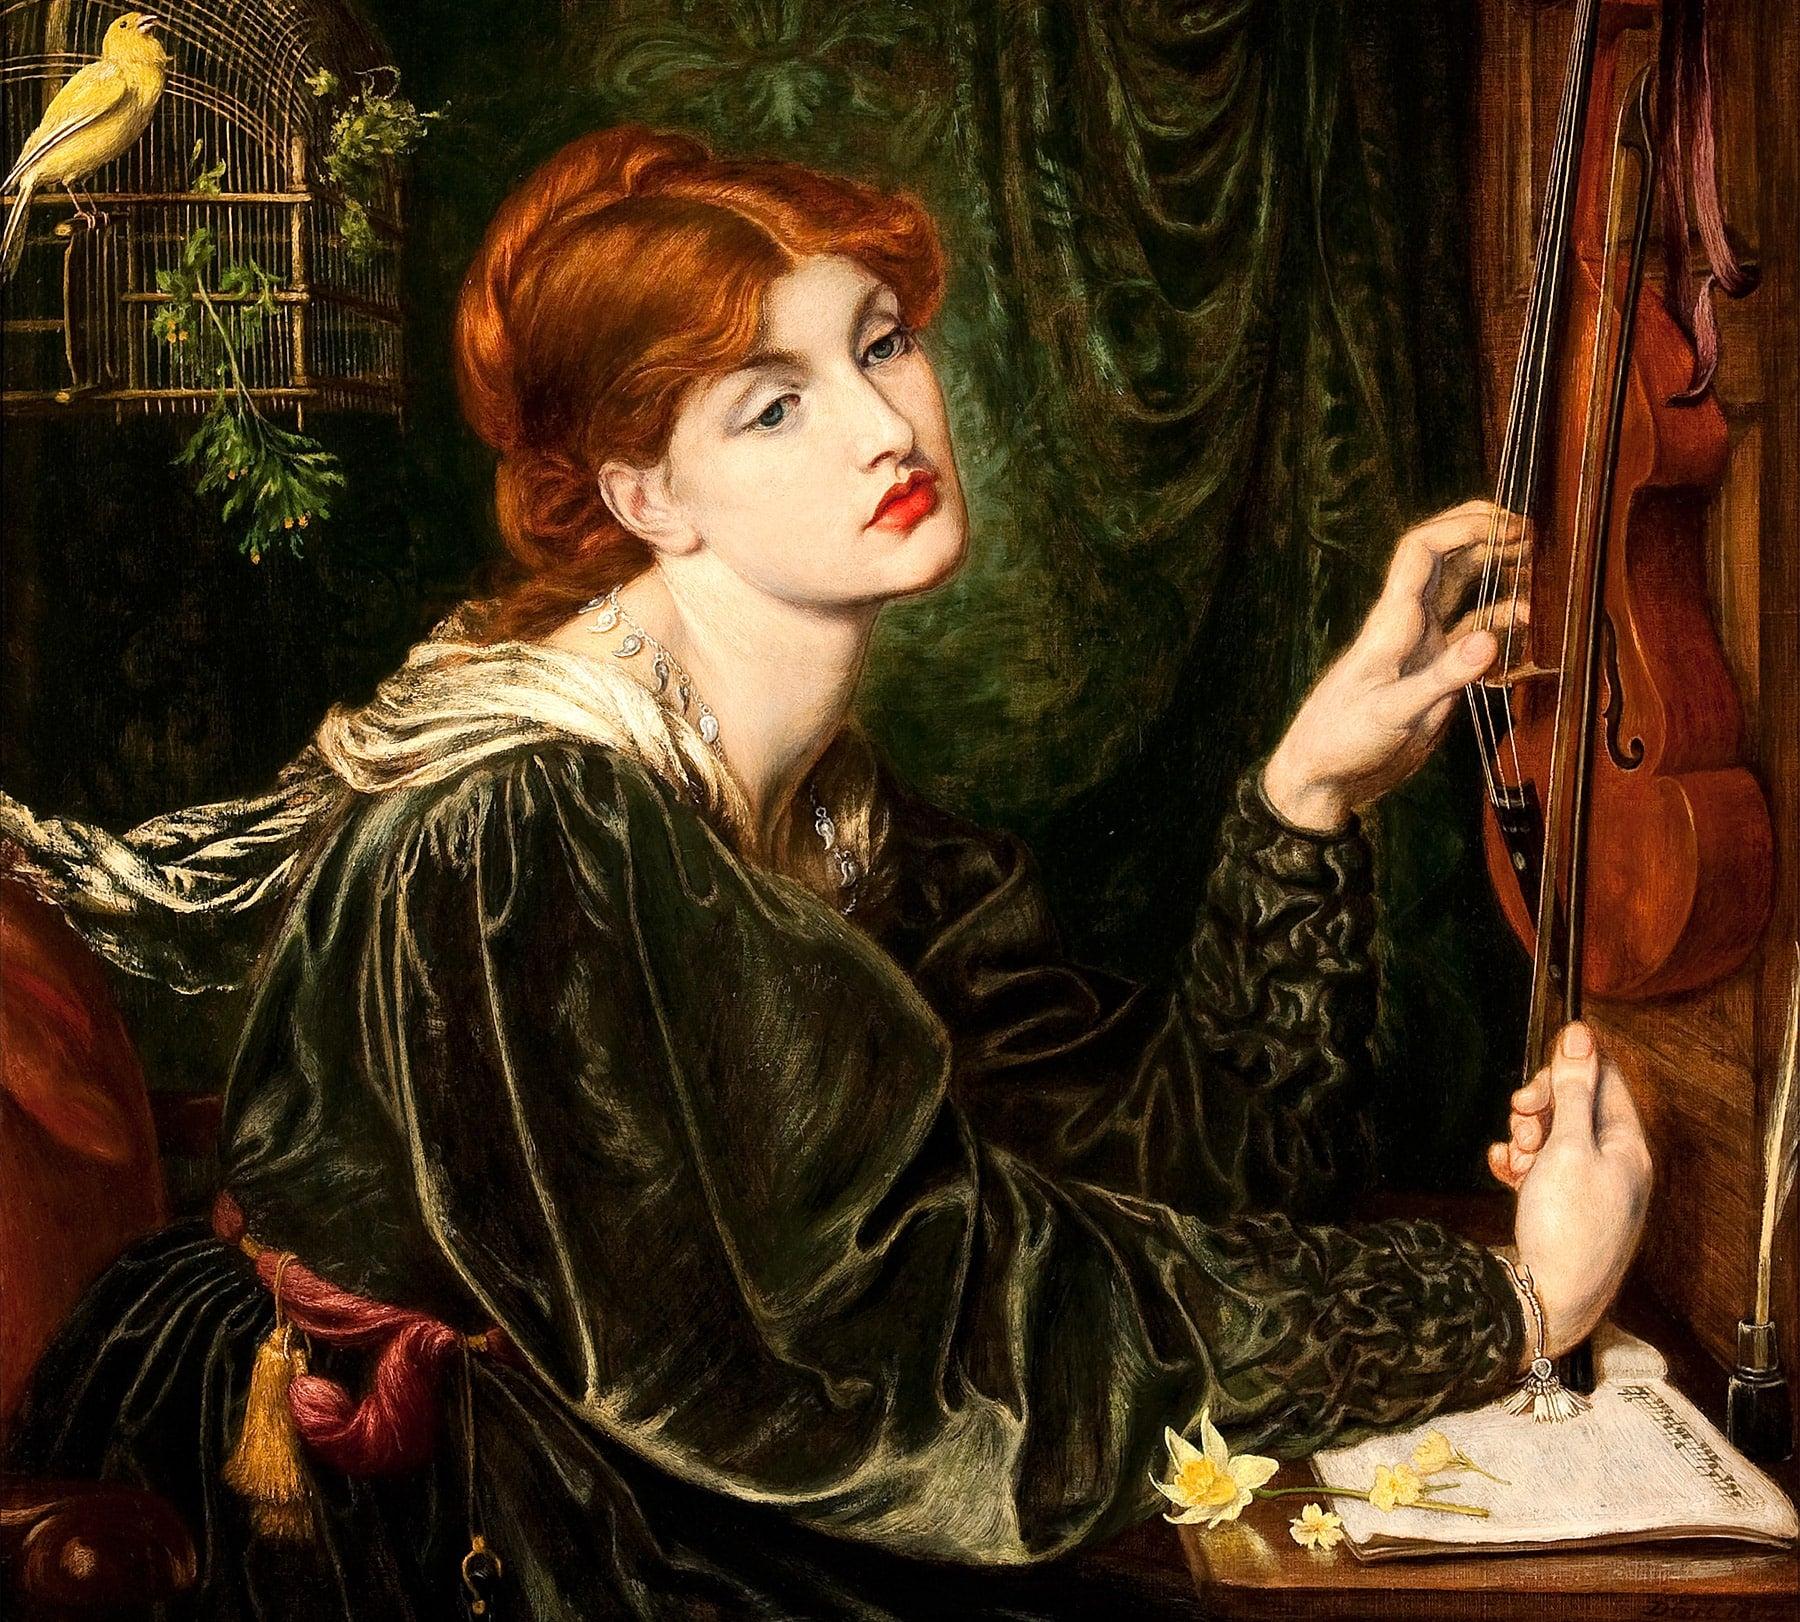 Veronica Veronese, 1872, by Dante Gabriel Rossetti